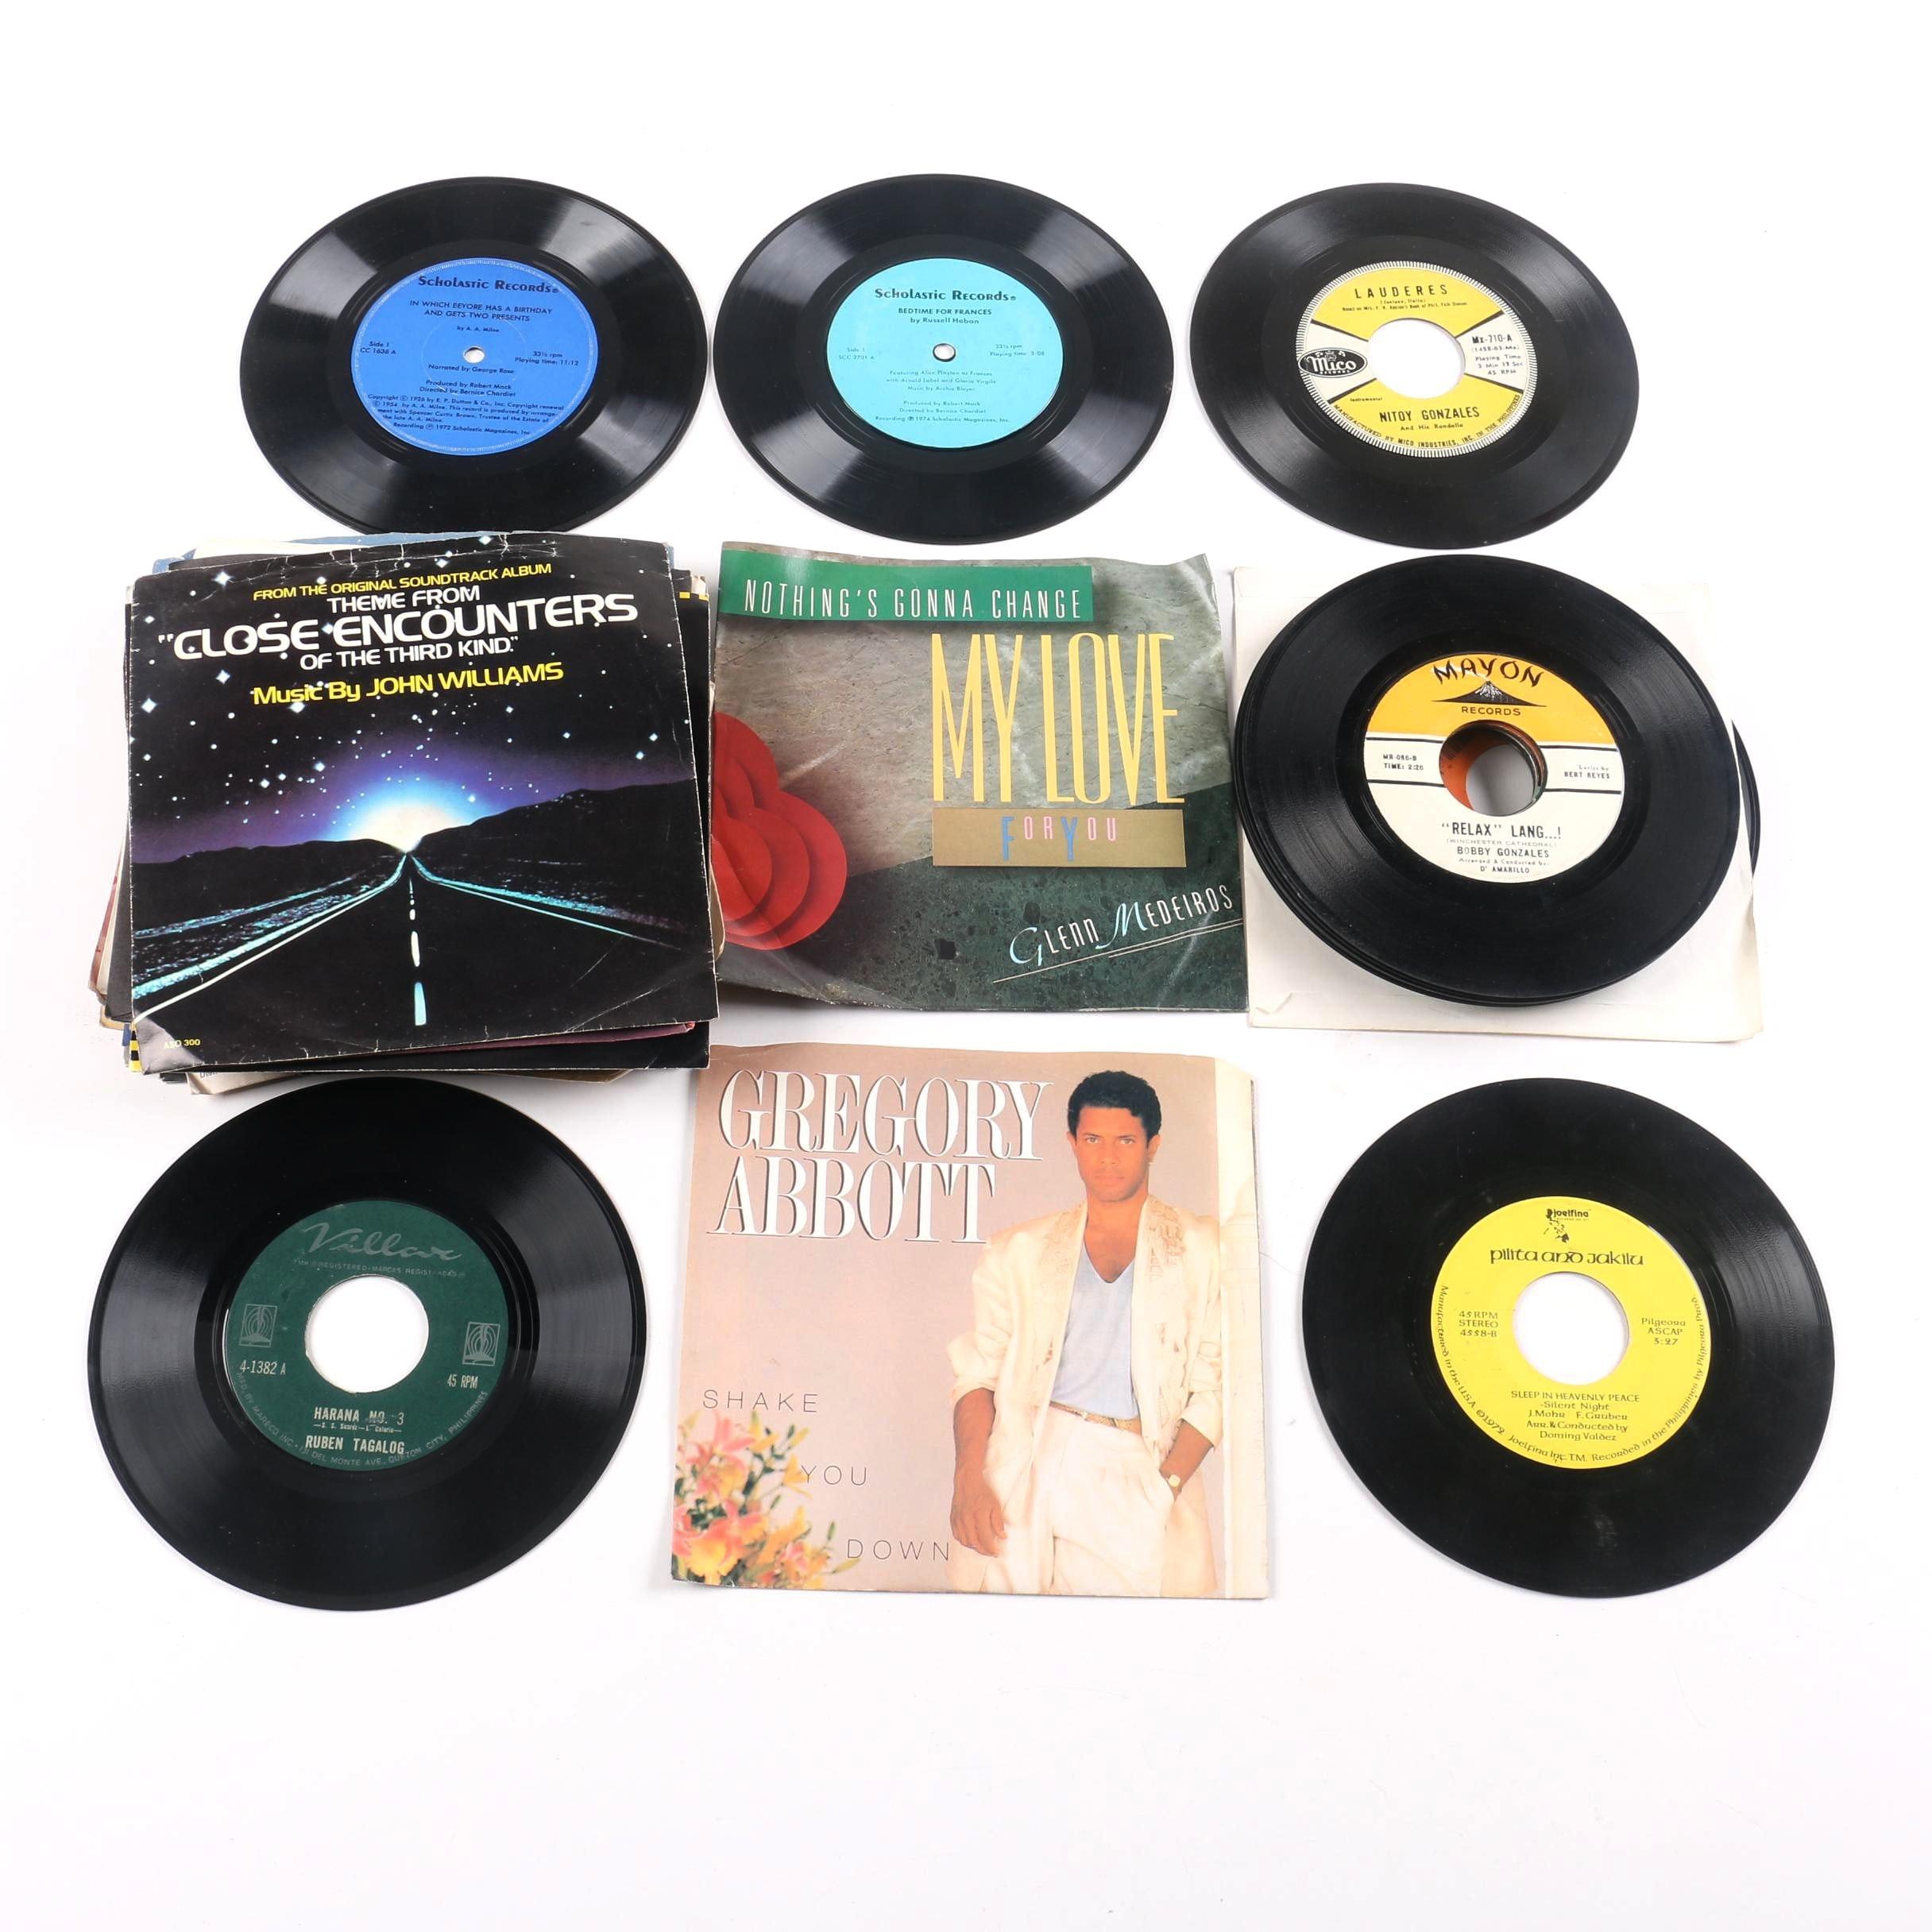 Janet Jackson, Klymaxx, Children's and Other 45 rpm Singles